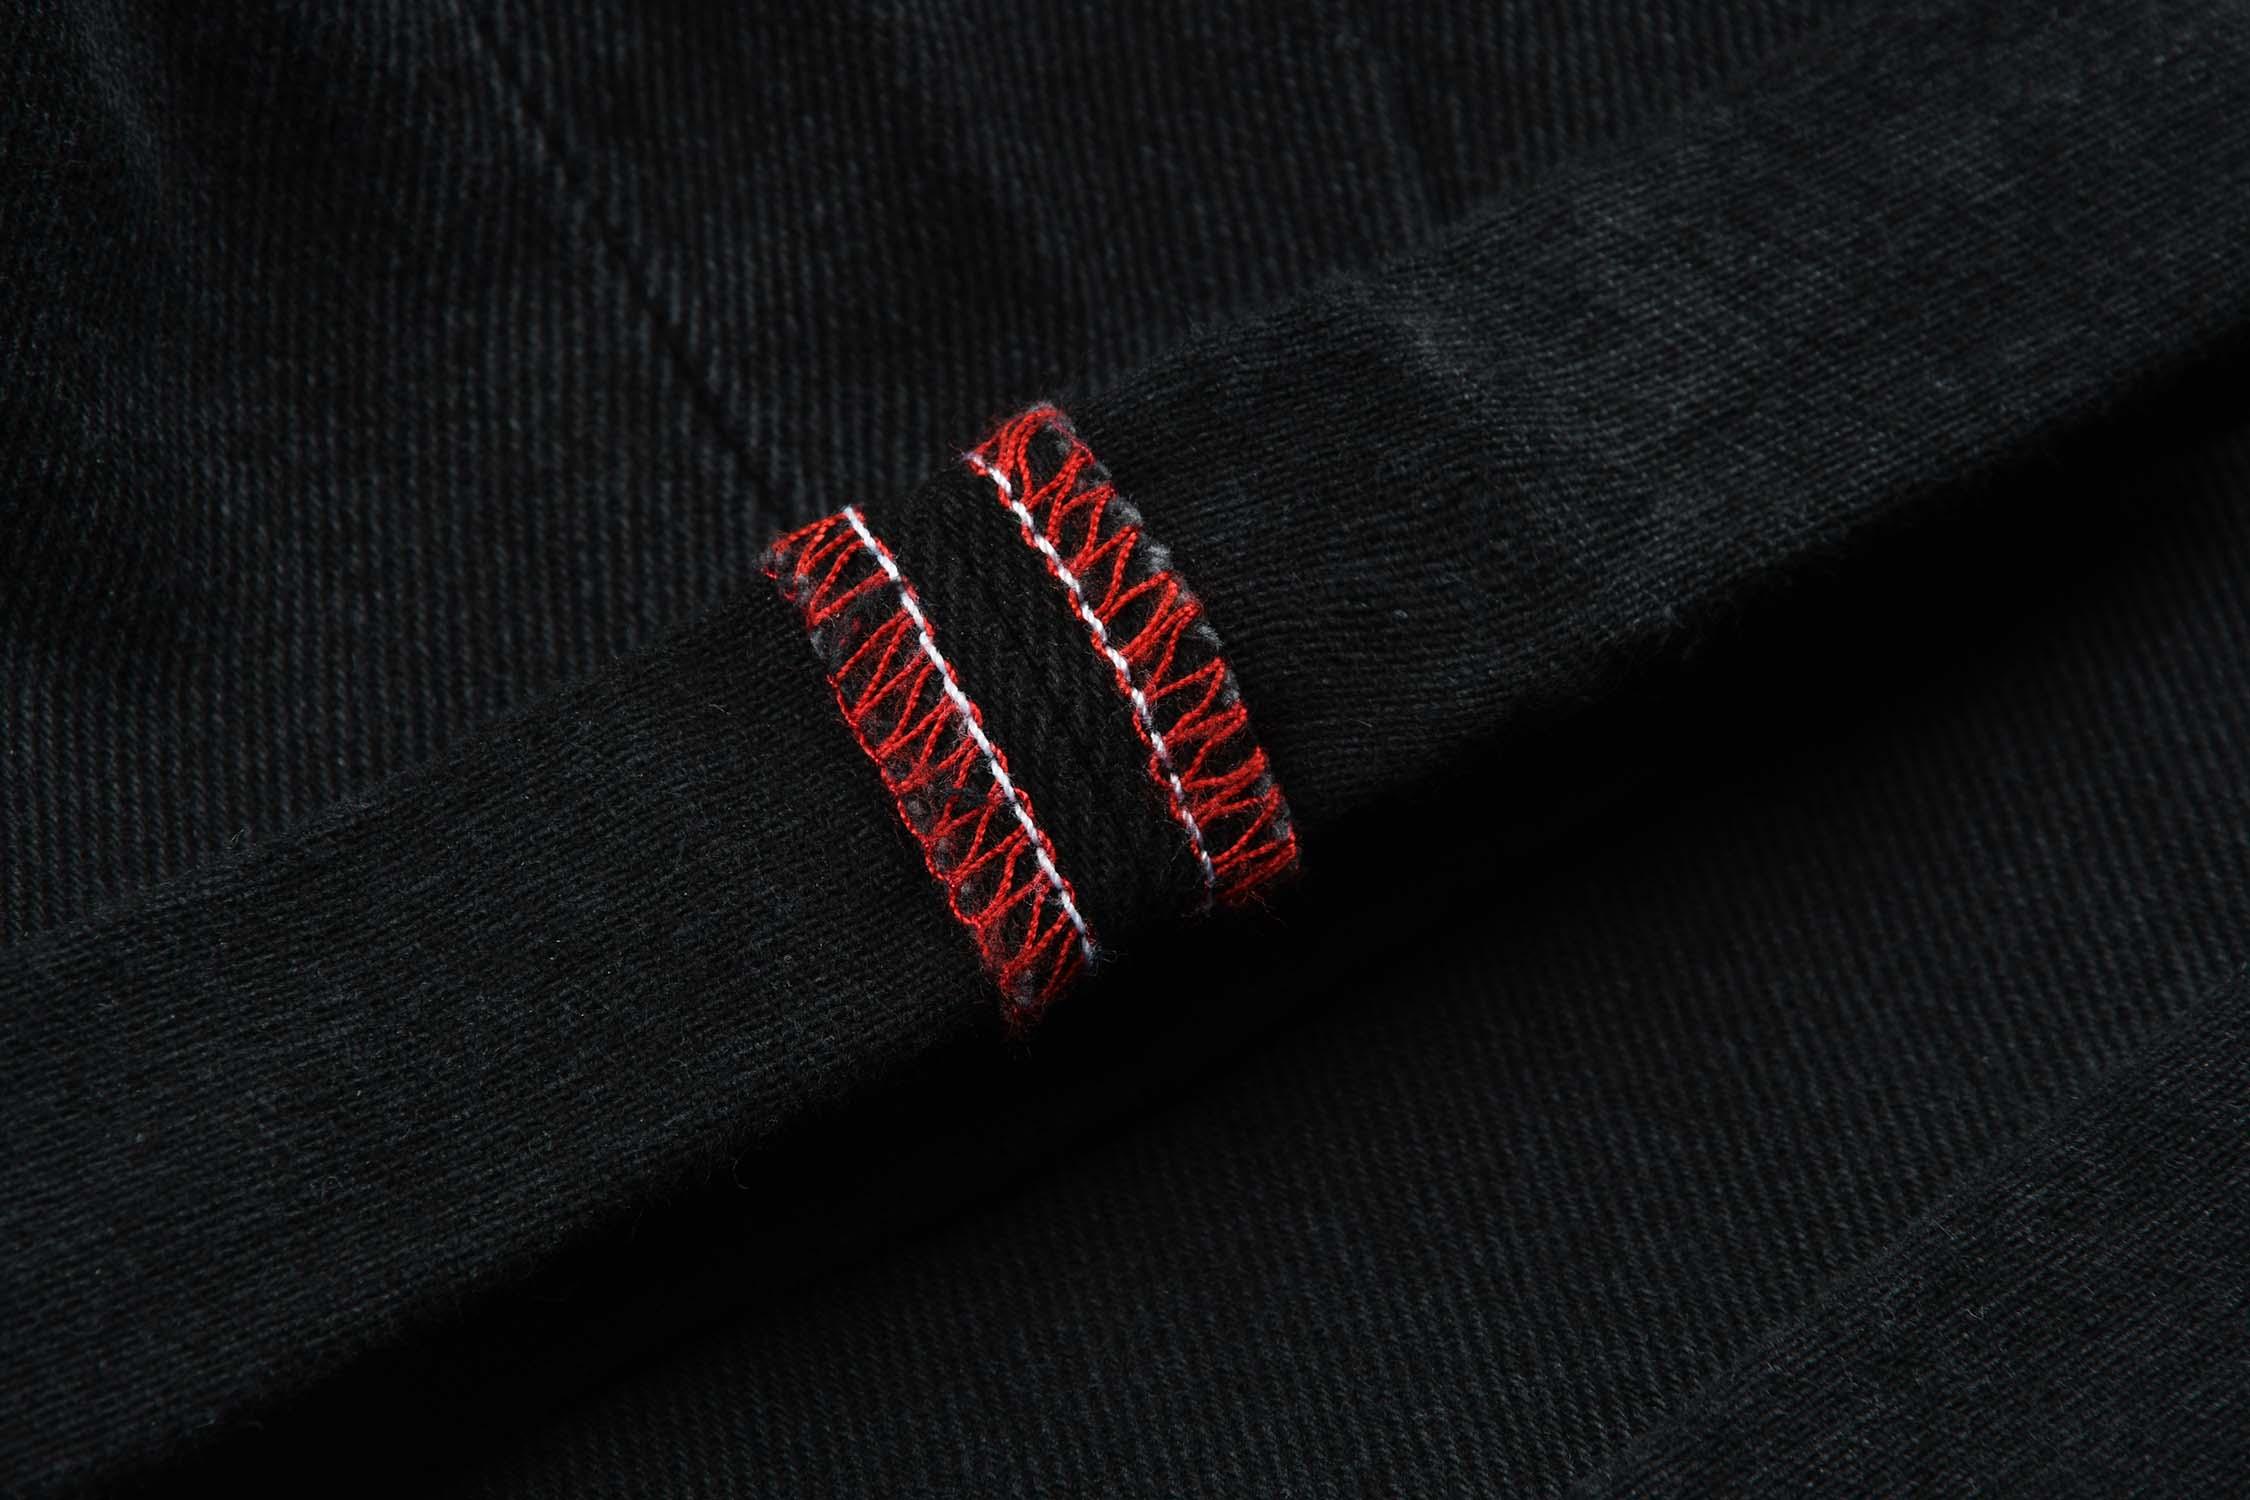 A-Salvarini-Designer-Herren-Jeans-Short-kurze-Sommer-Hose-Jeansshorts-Bermuda Indexbild 31